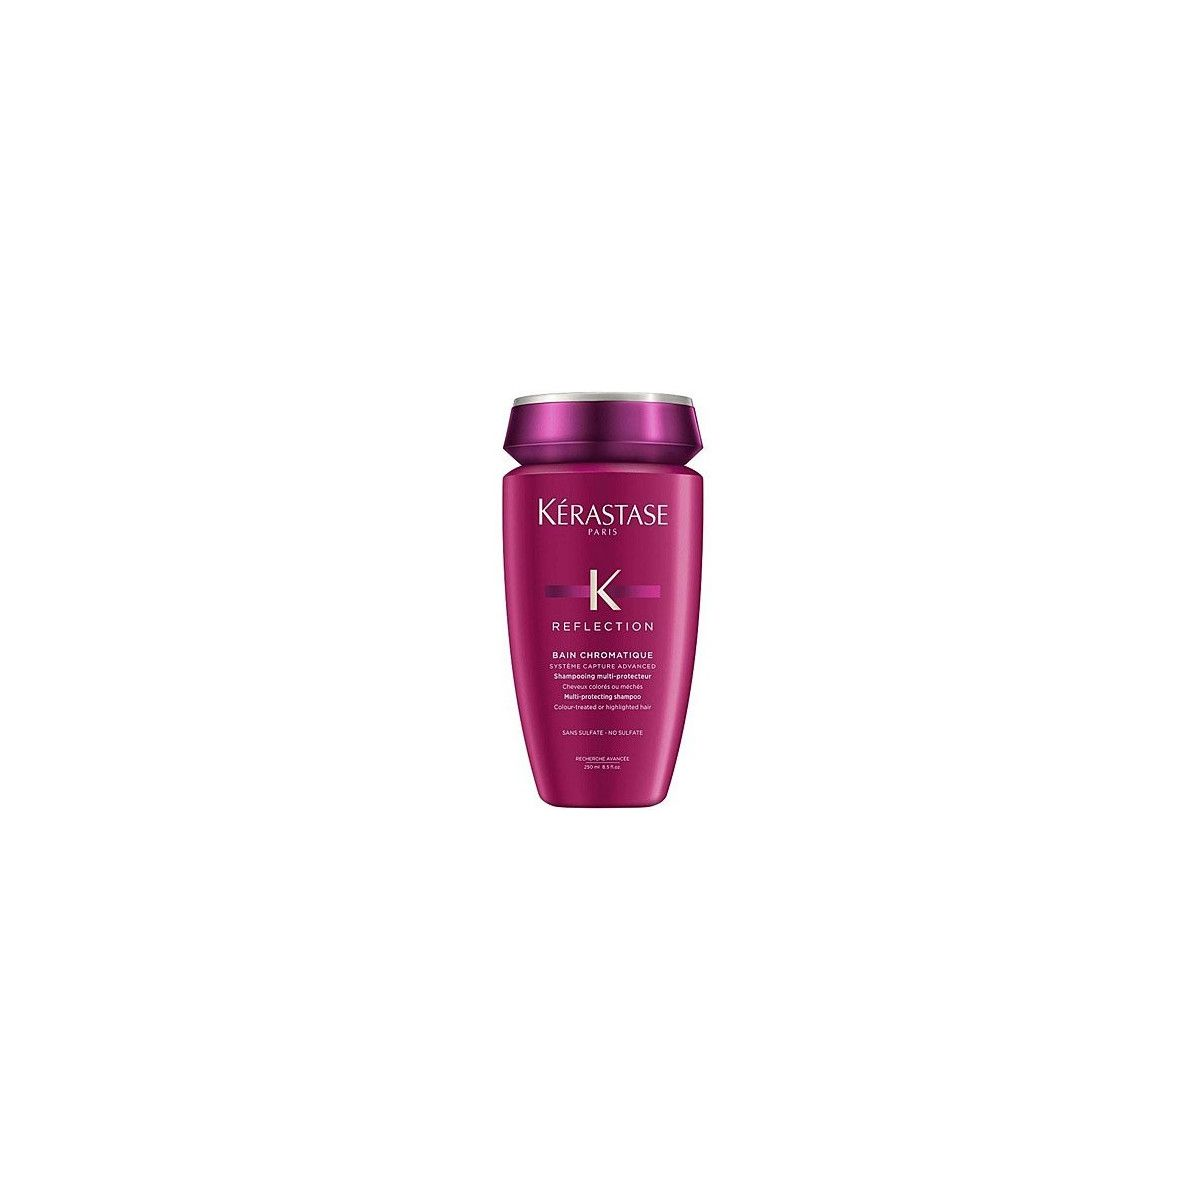 KERASTASE Reflection Chromatique Bain kąpiel chroniąca kolor włosów, szampon 250ml